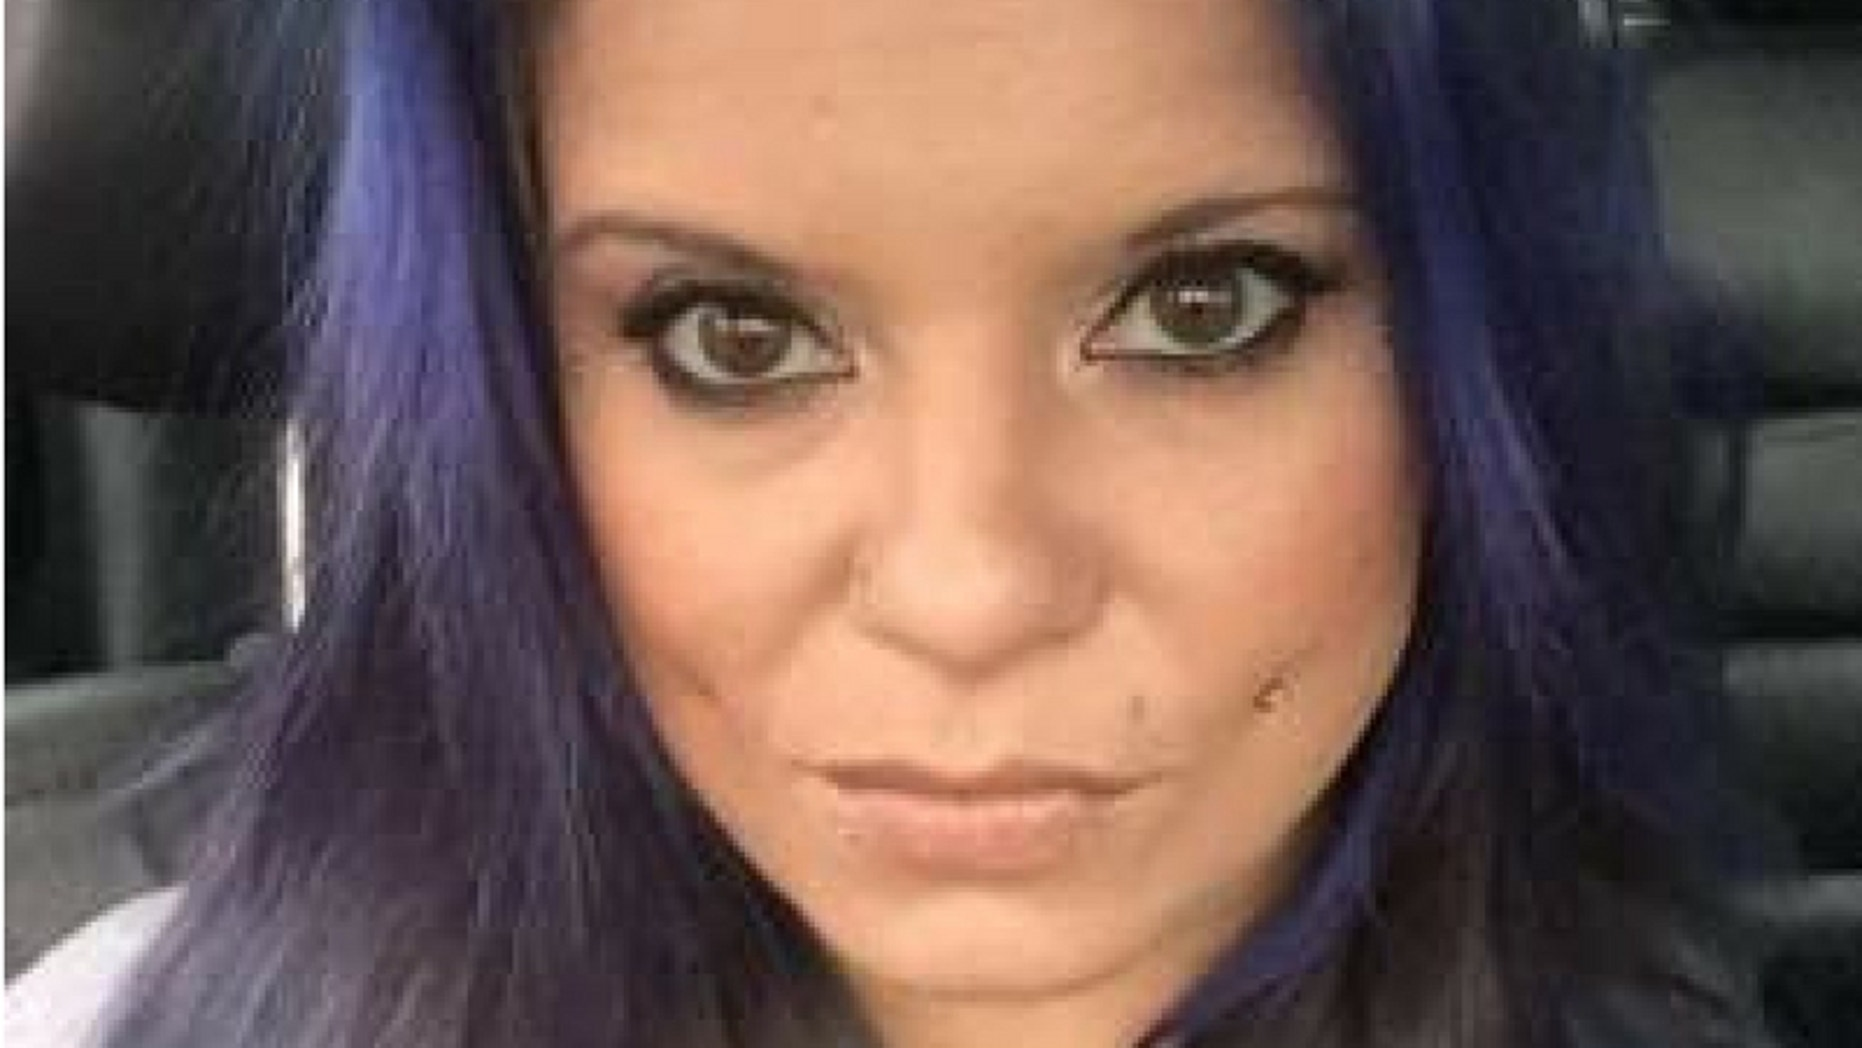 Joanne Ringer was last seen in Clarksburg, Massachusetts on March 2. (Berkshire District Attorney's office)